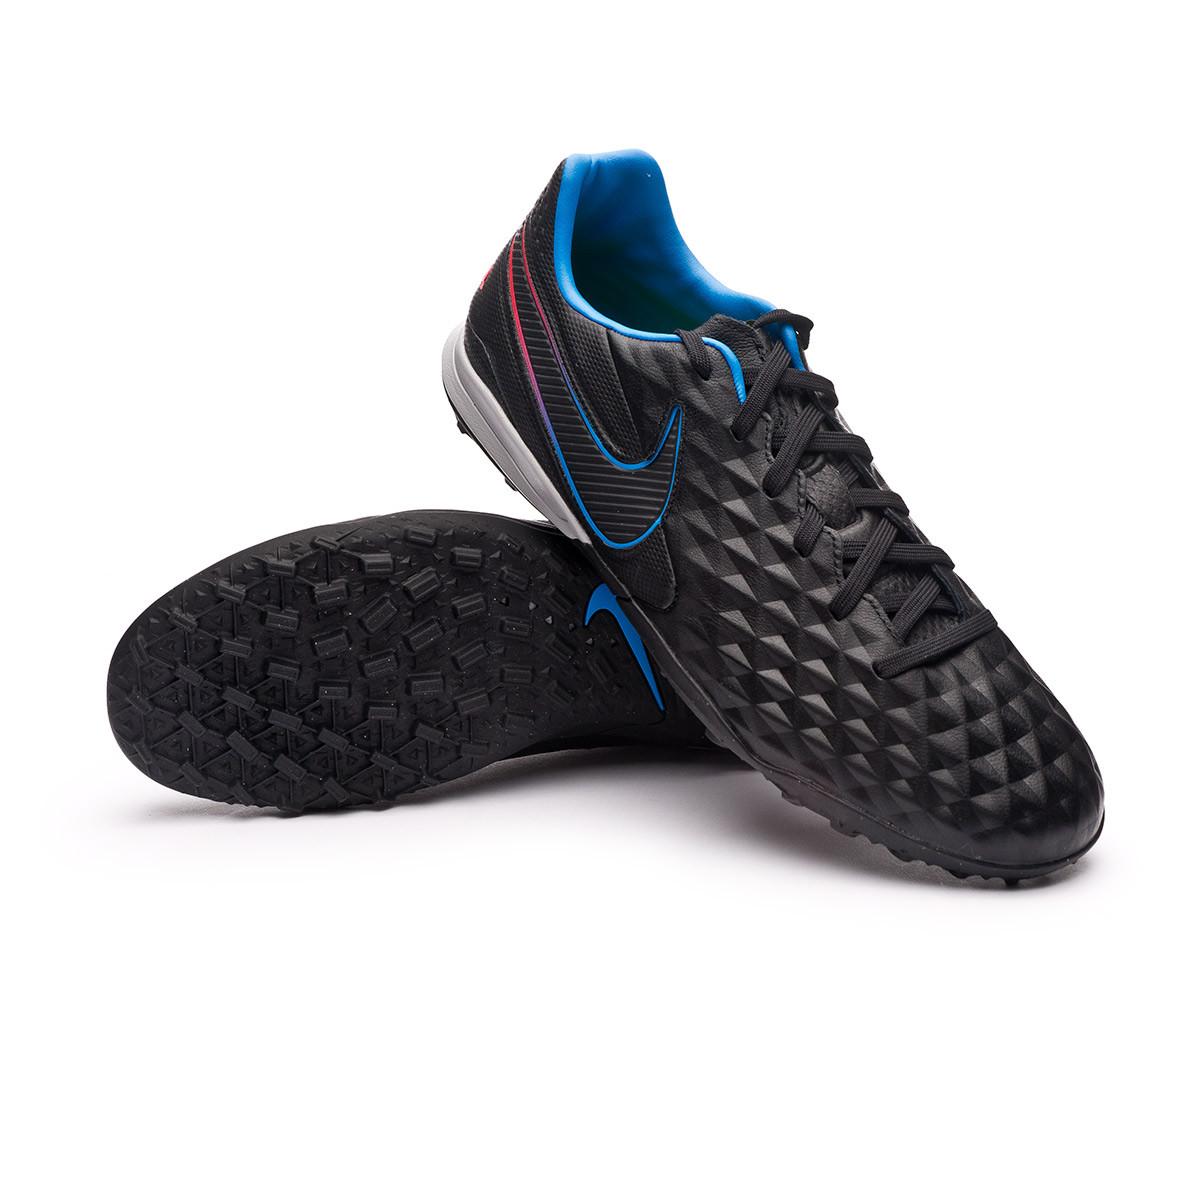 Chaussure de foot Nike Tiempo Legend 8 Pro Turf Black-Black-Siren ...